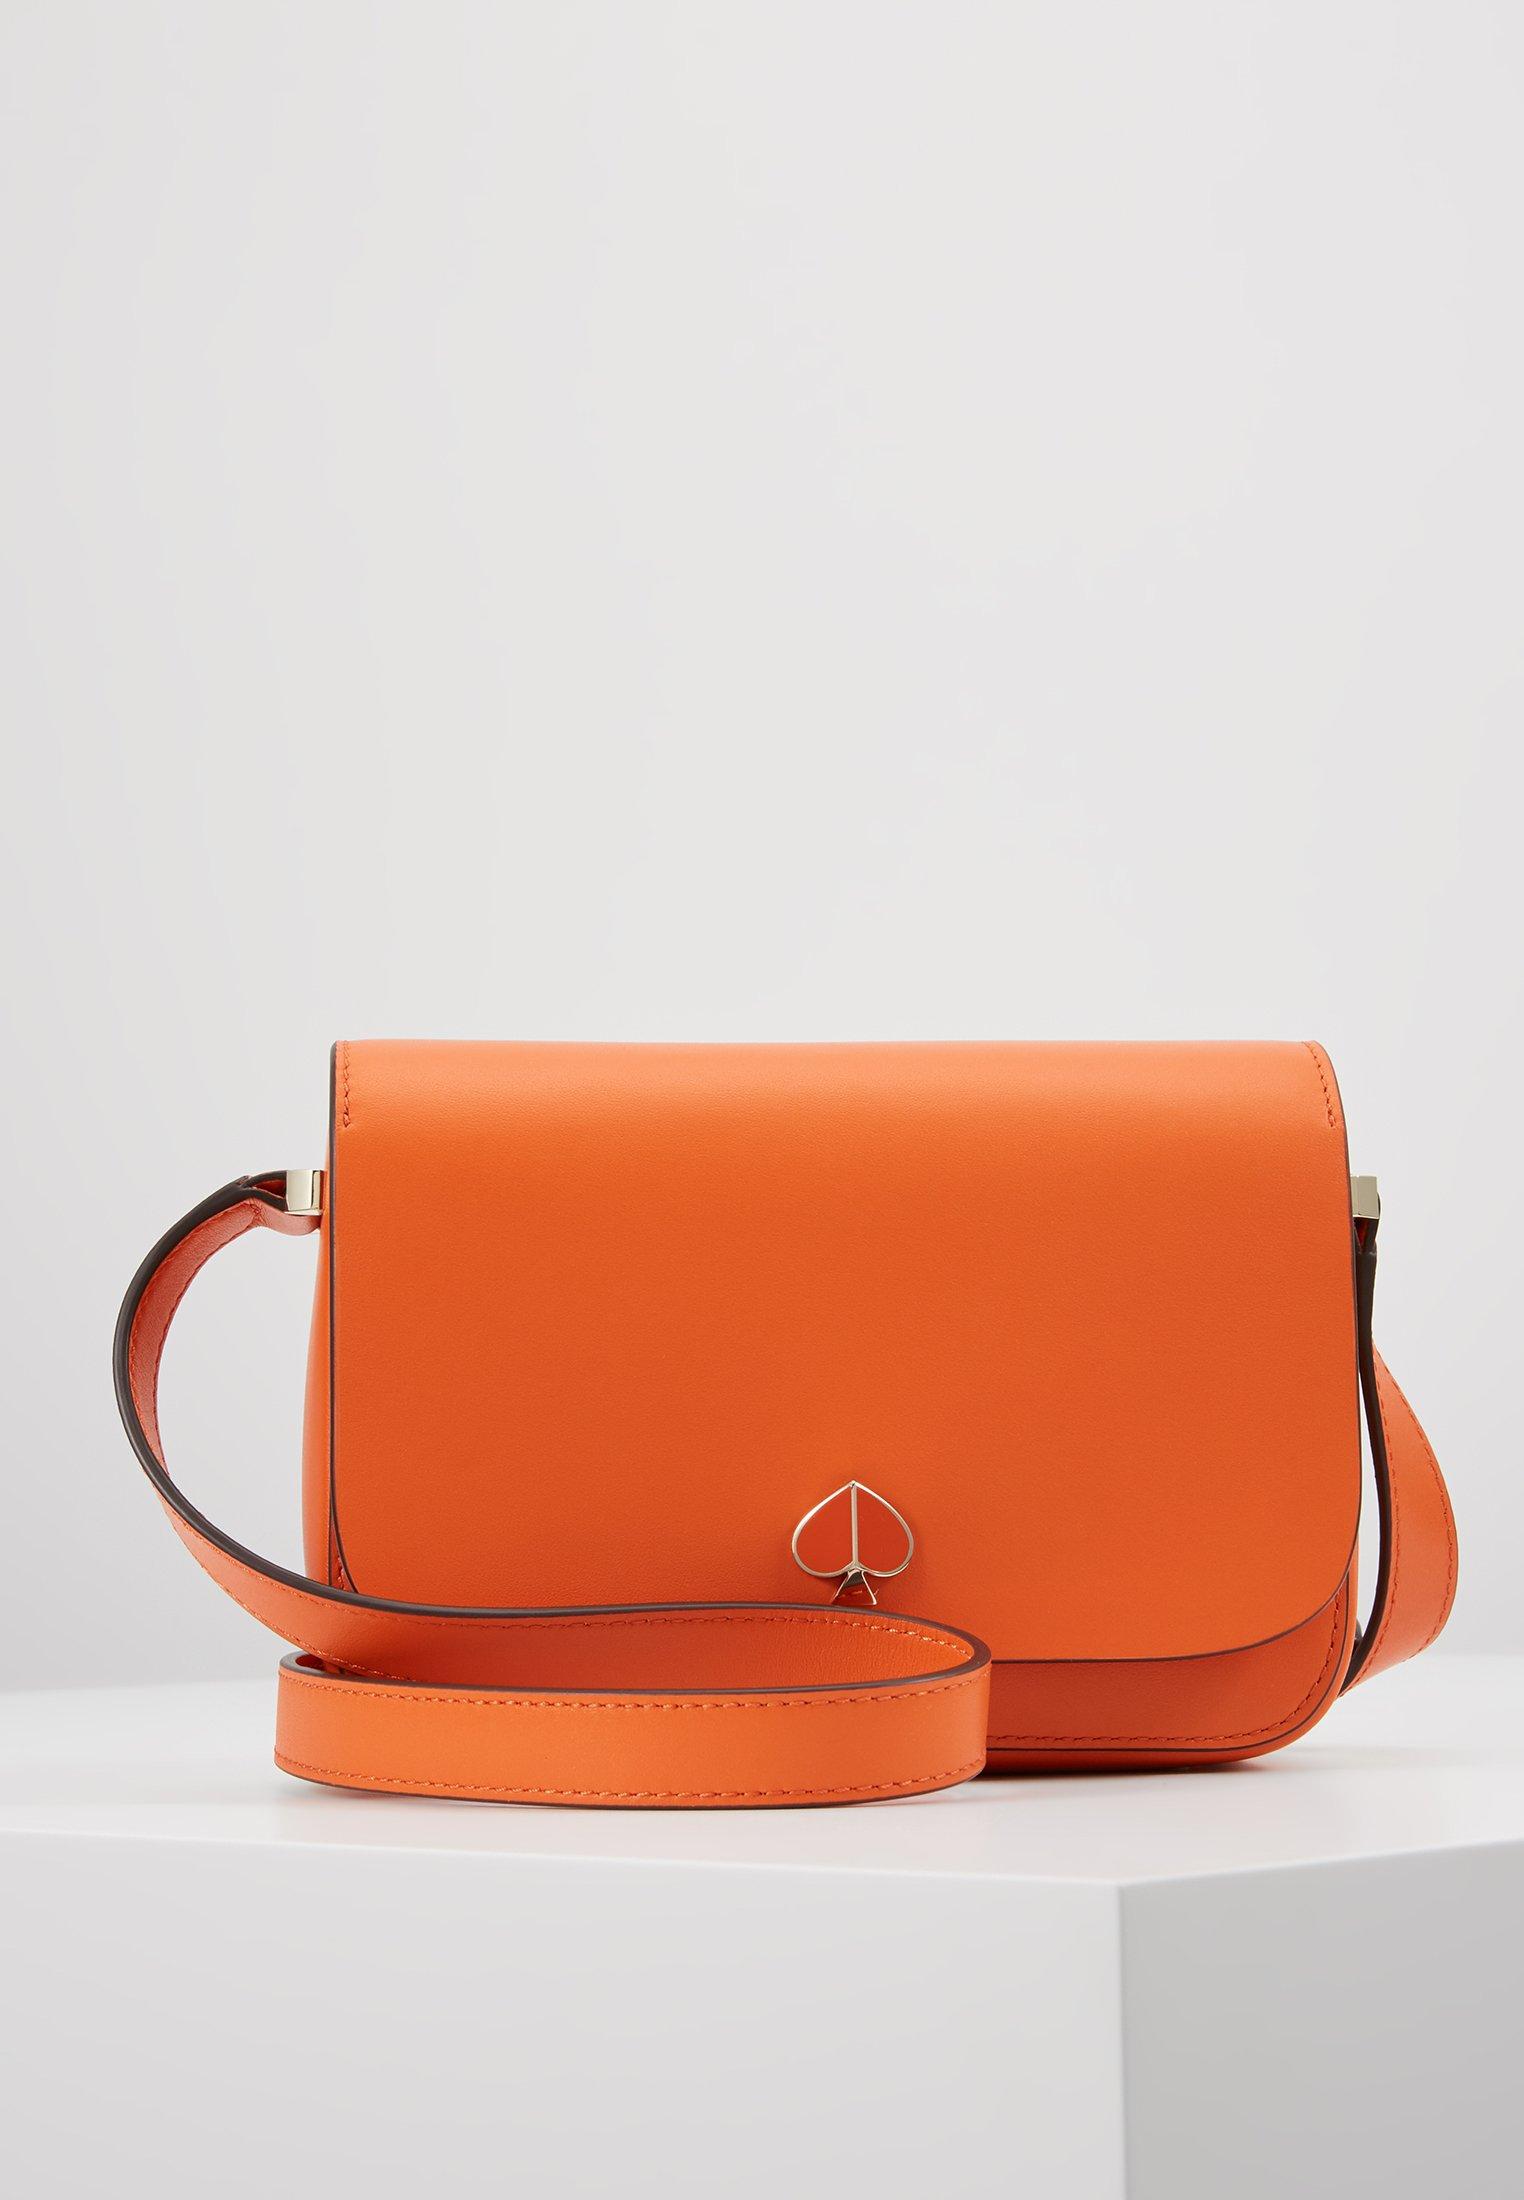 Flap Spade Bandoulière ShoulderSac Small York Orange New Kate Nicola Juicy IYfg6m7yvb